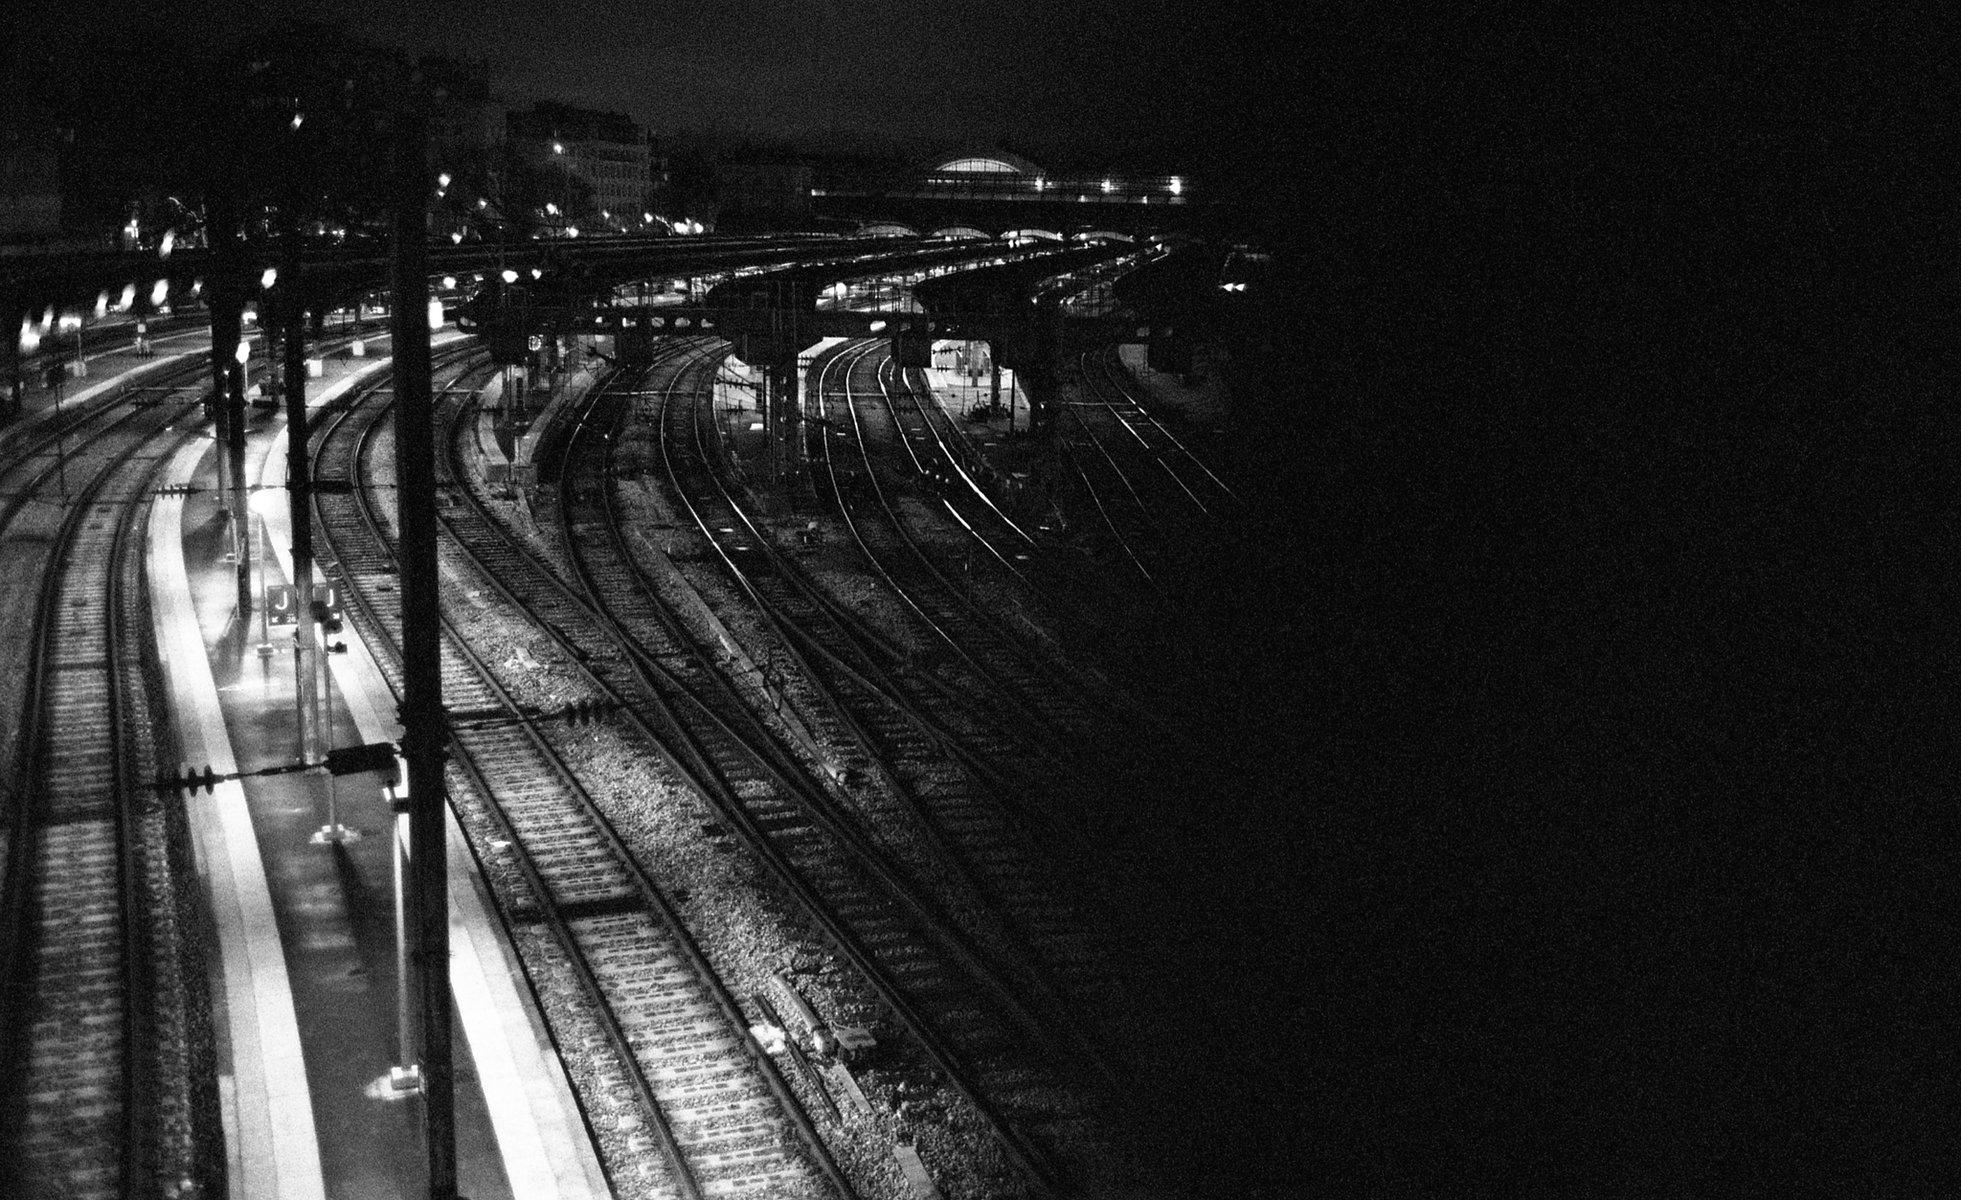 Jean-Pierre Damen urban and street photography - roll10_002.jpg